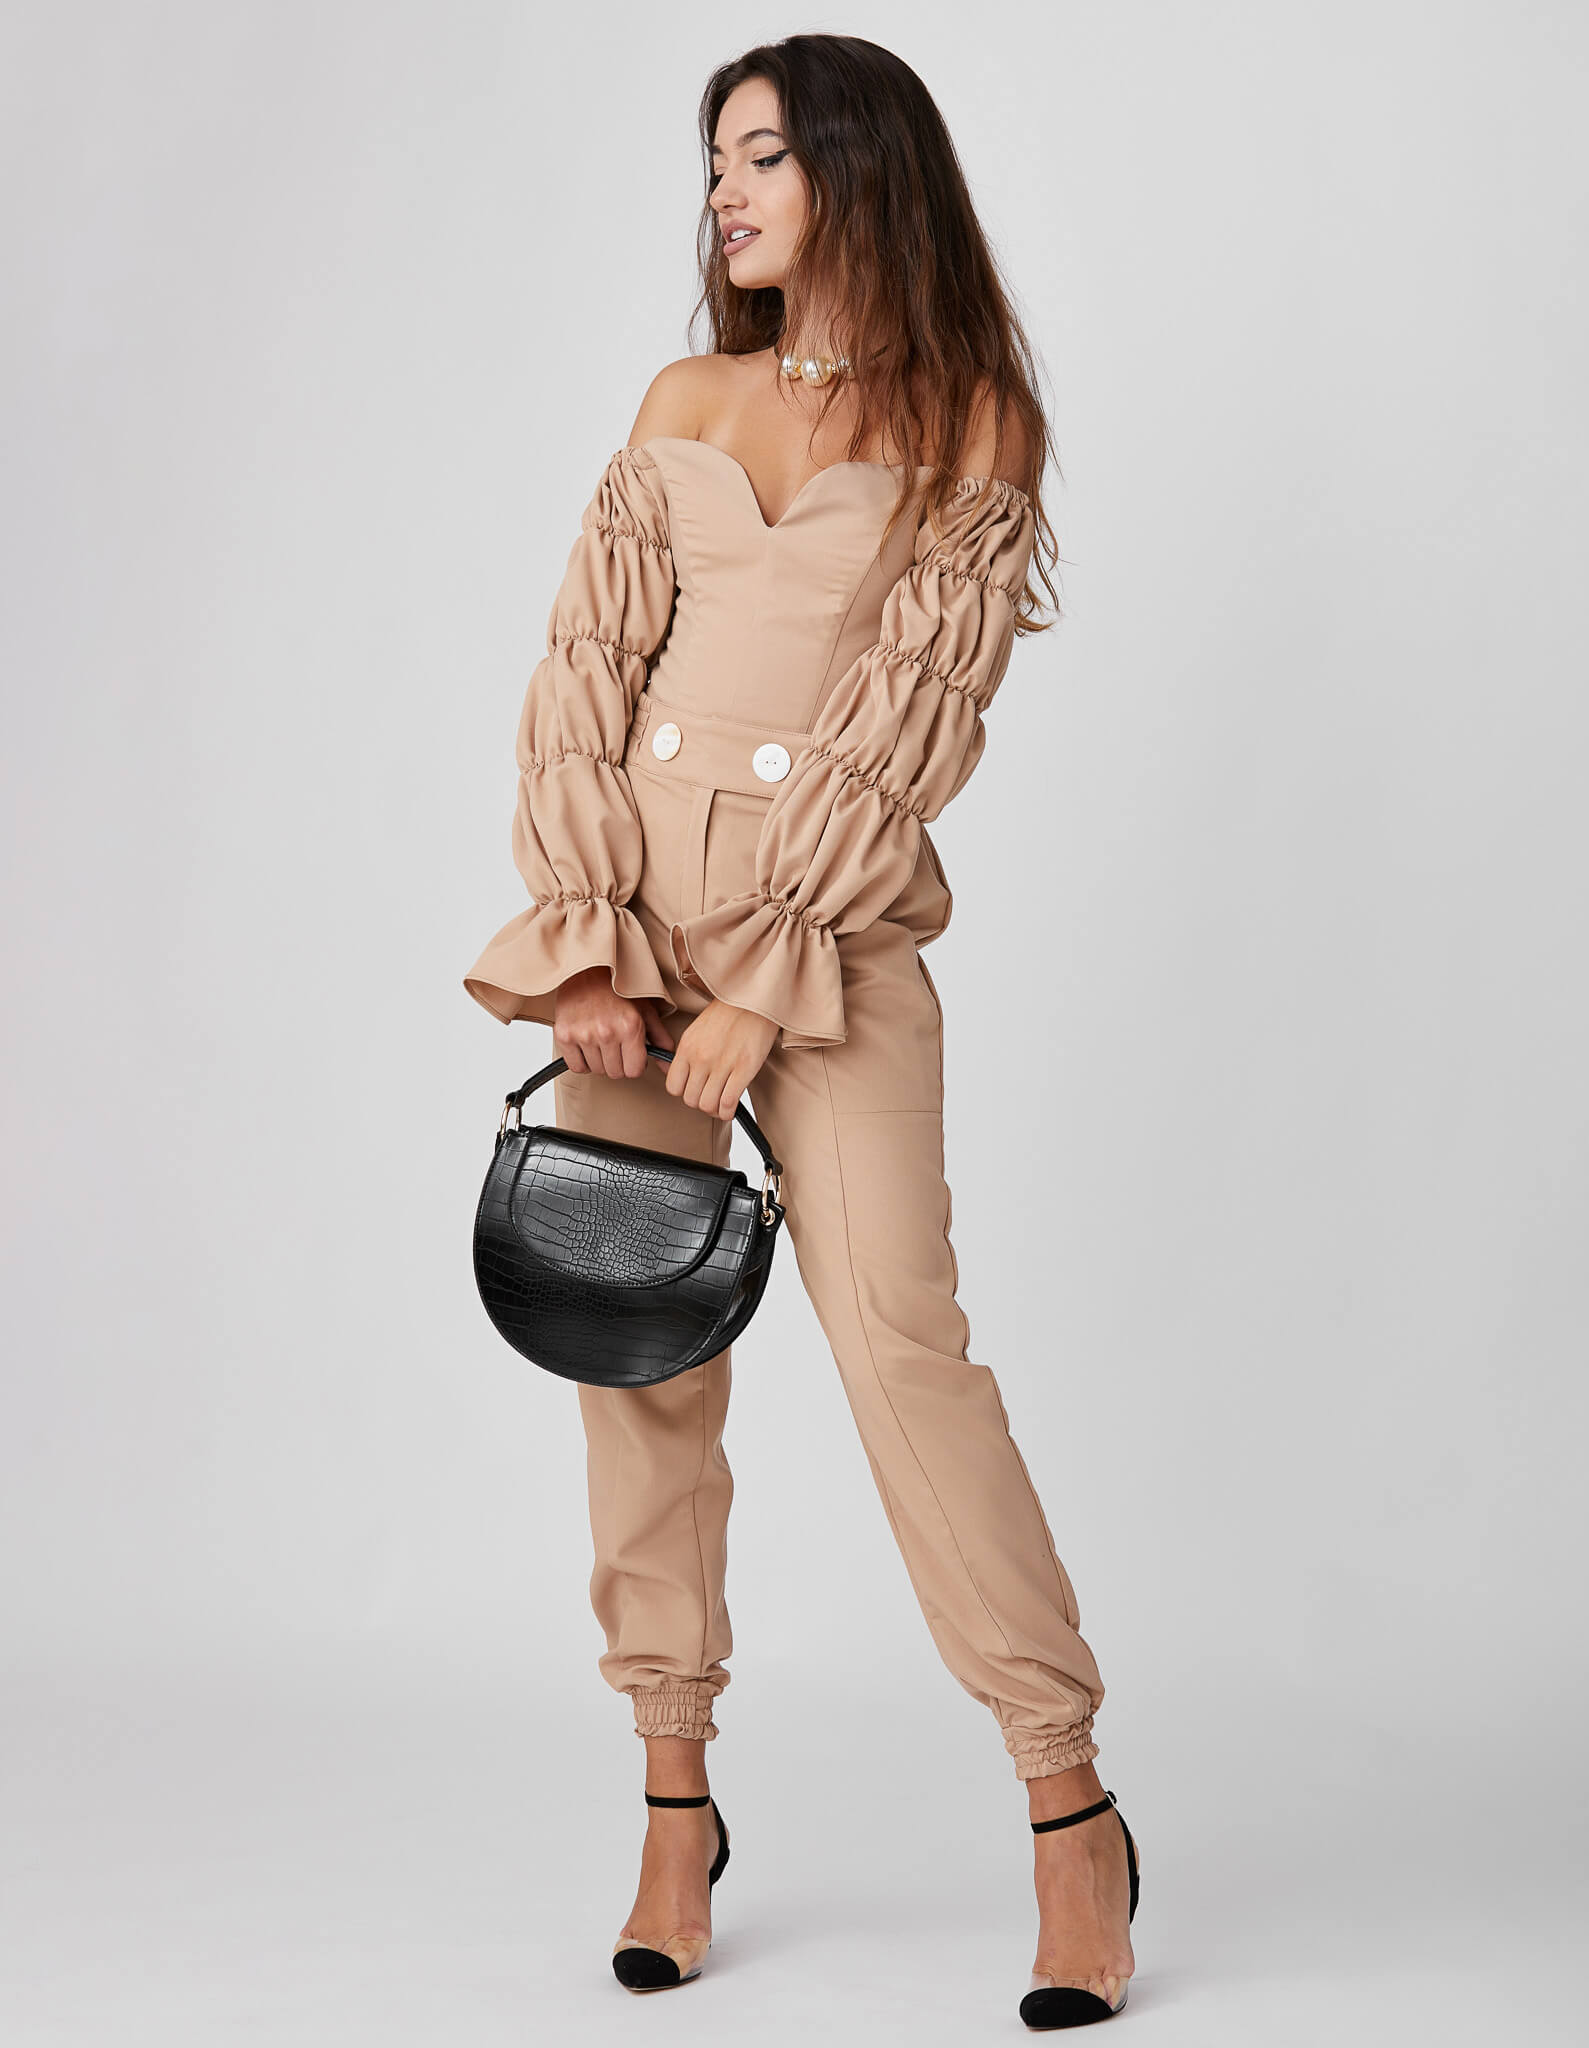 Corset camel ROSSINI